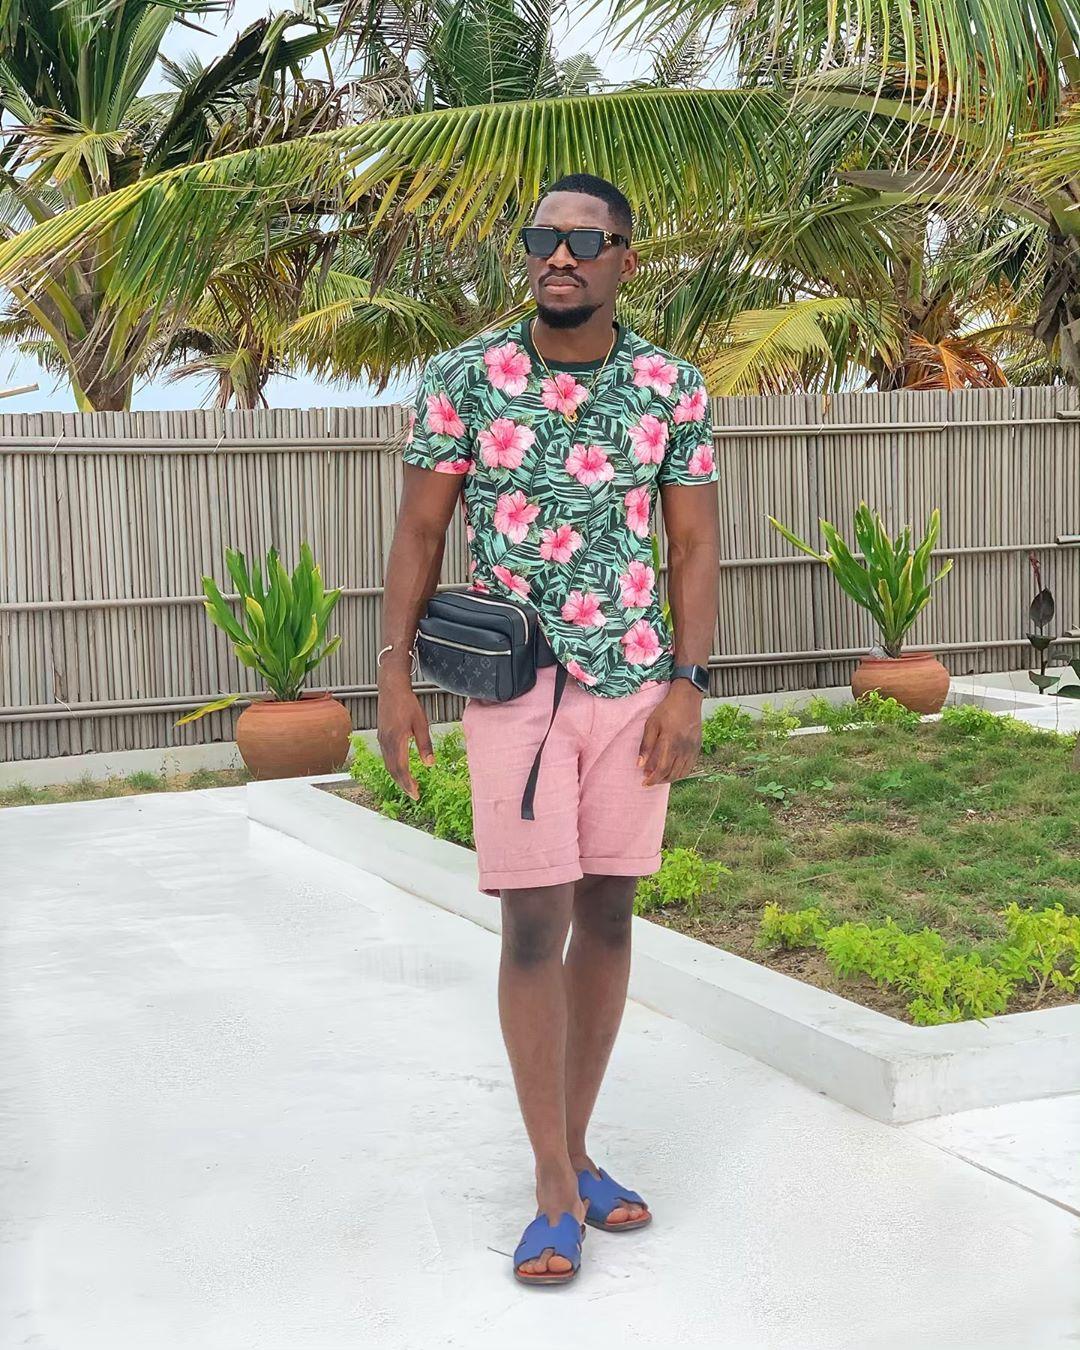 pastel-man-shorts-tobi-bakre-summer-casual-style-rave